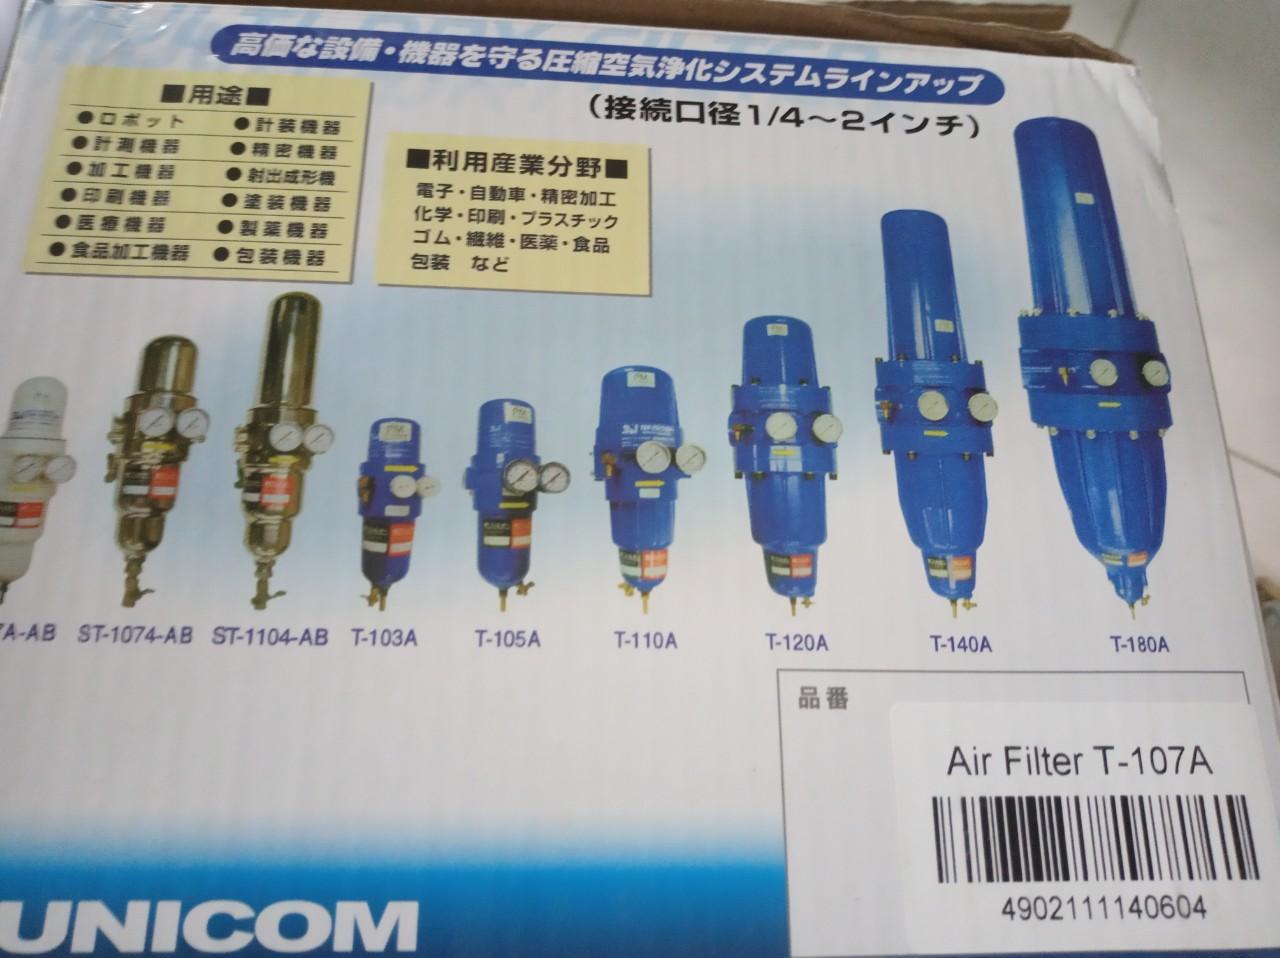 BỘ LỌC (AIR FILTER) T-107A